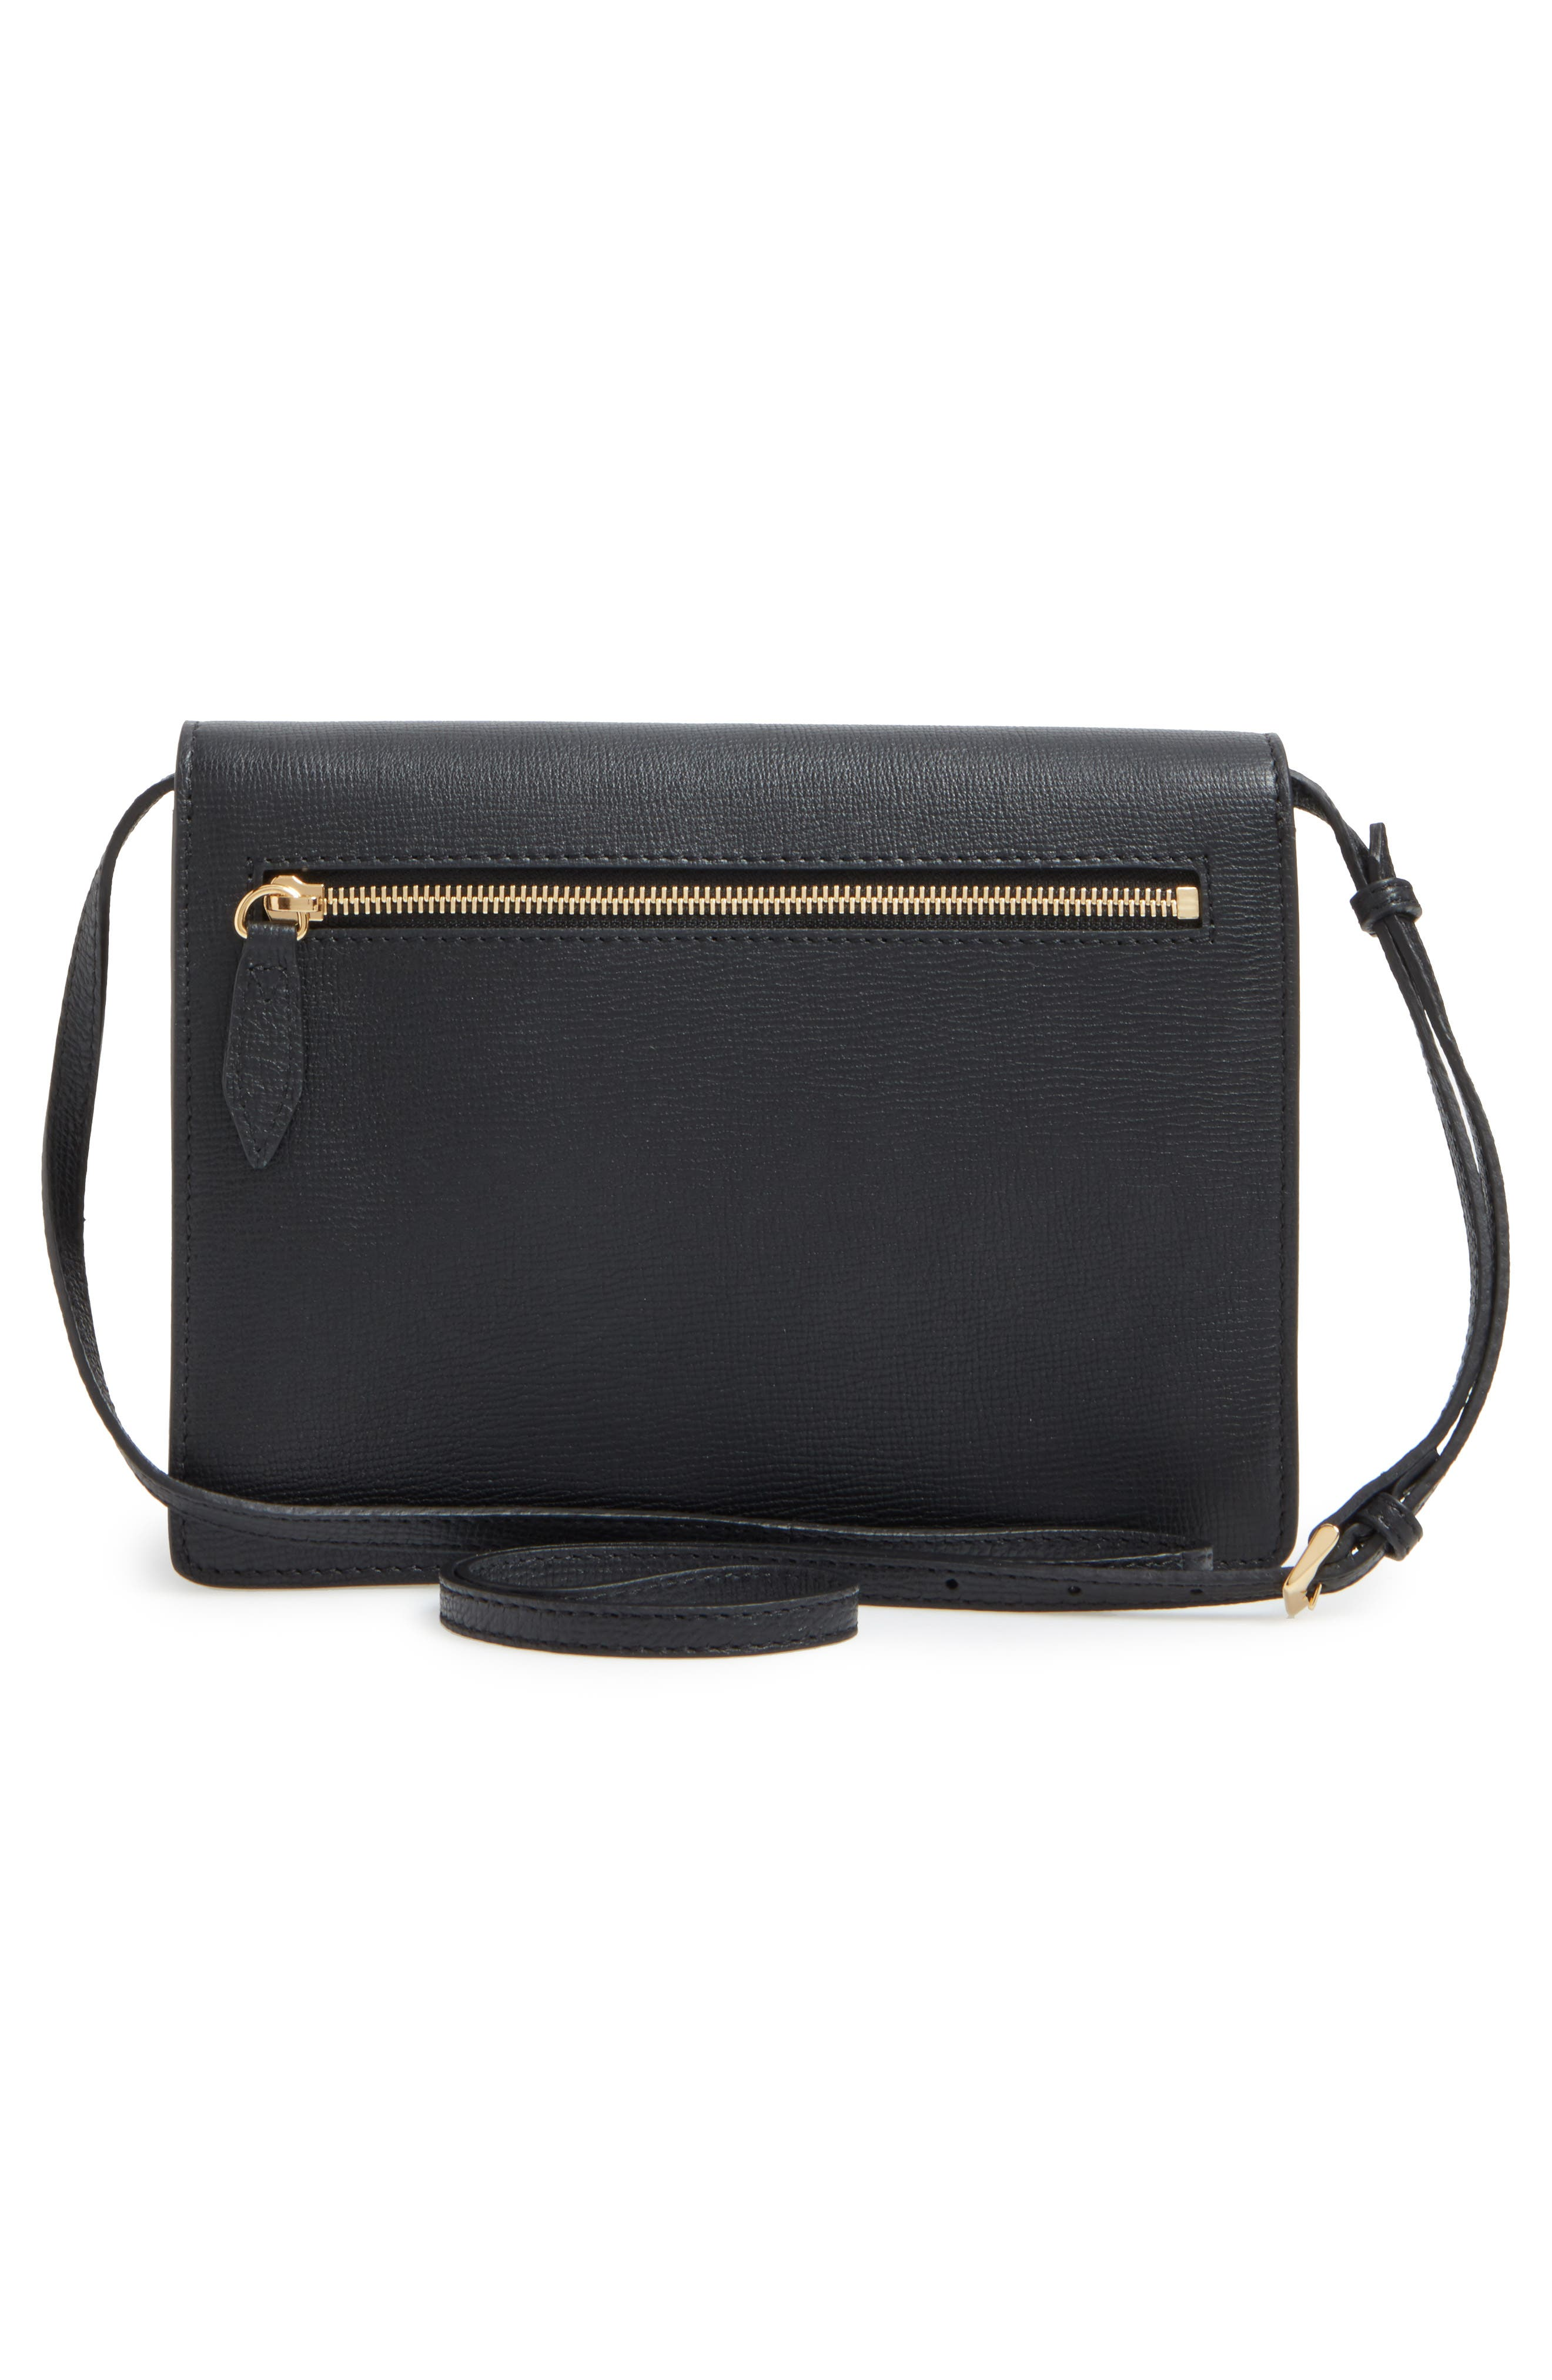 'Small Macken' Check Crossbody Bag,                             Alternate thumbnail 3, color,                             BLACK